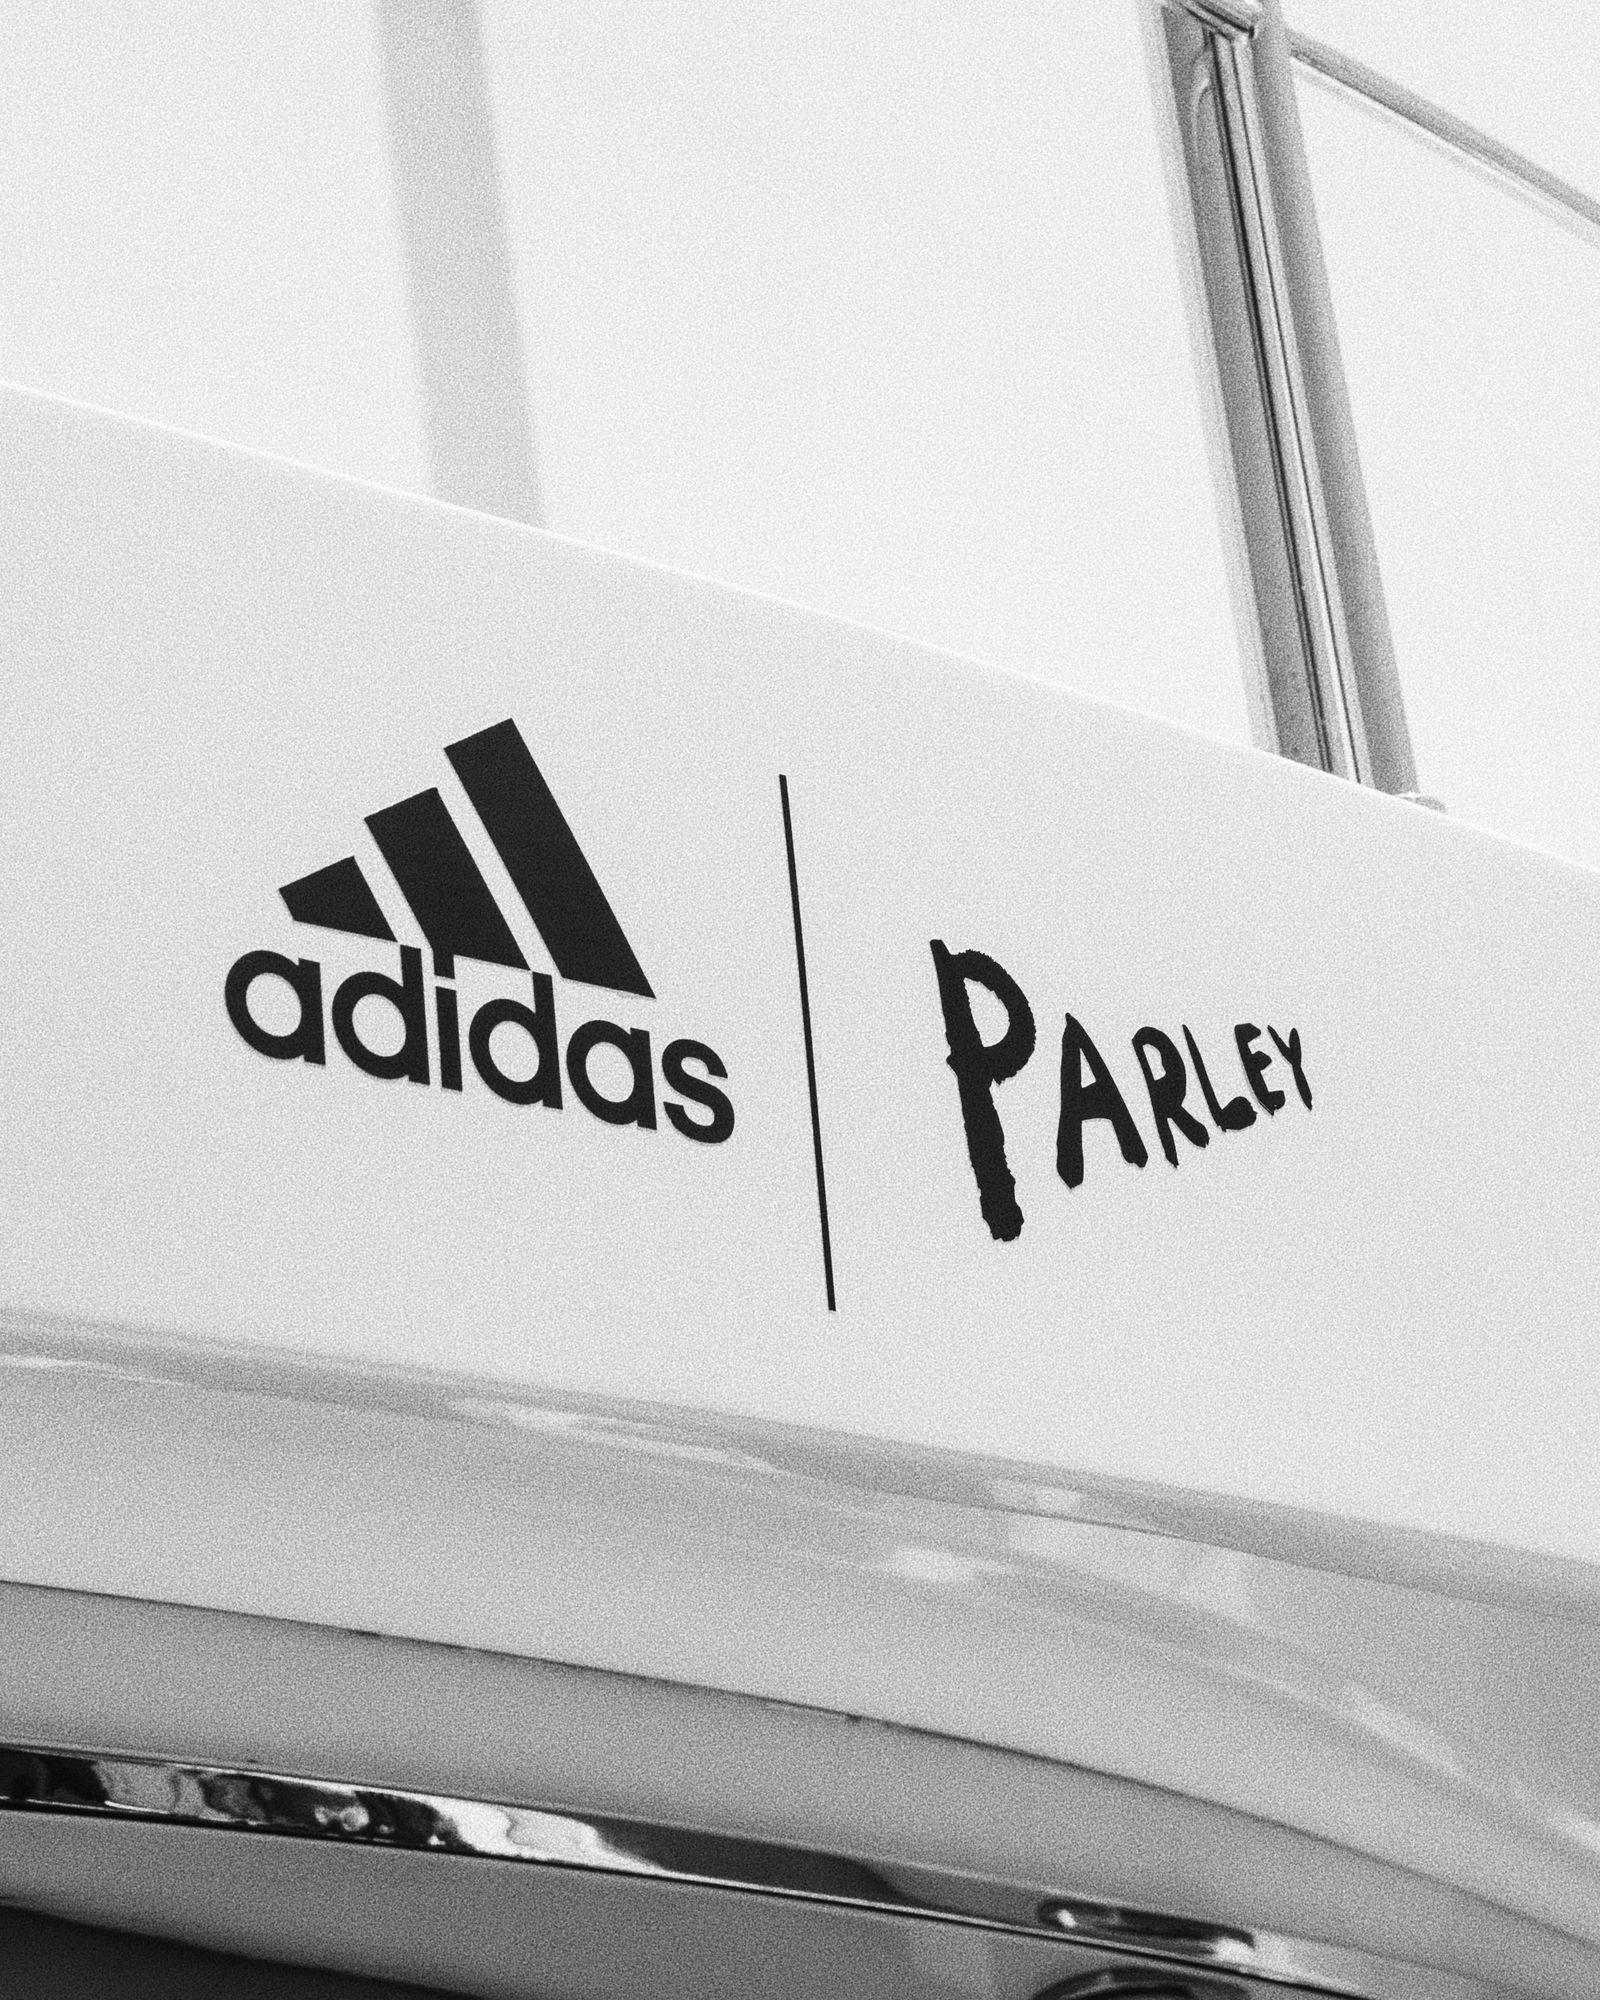 Manchester-United-Parley-Ocean-Adidas-06